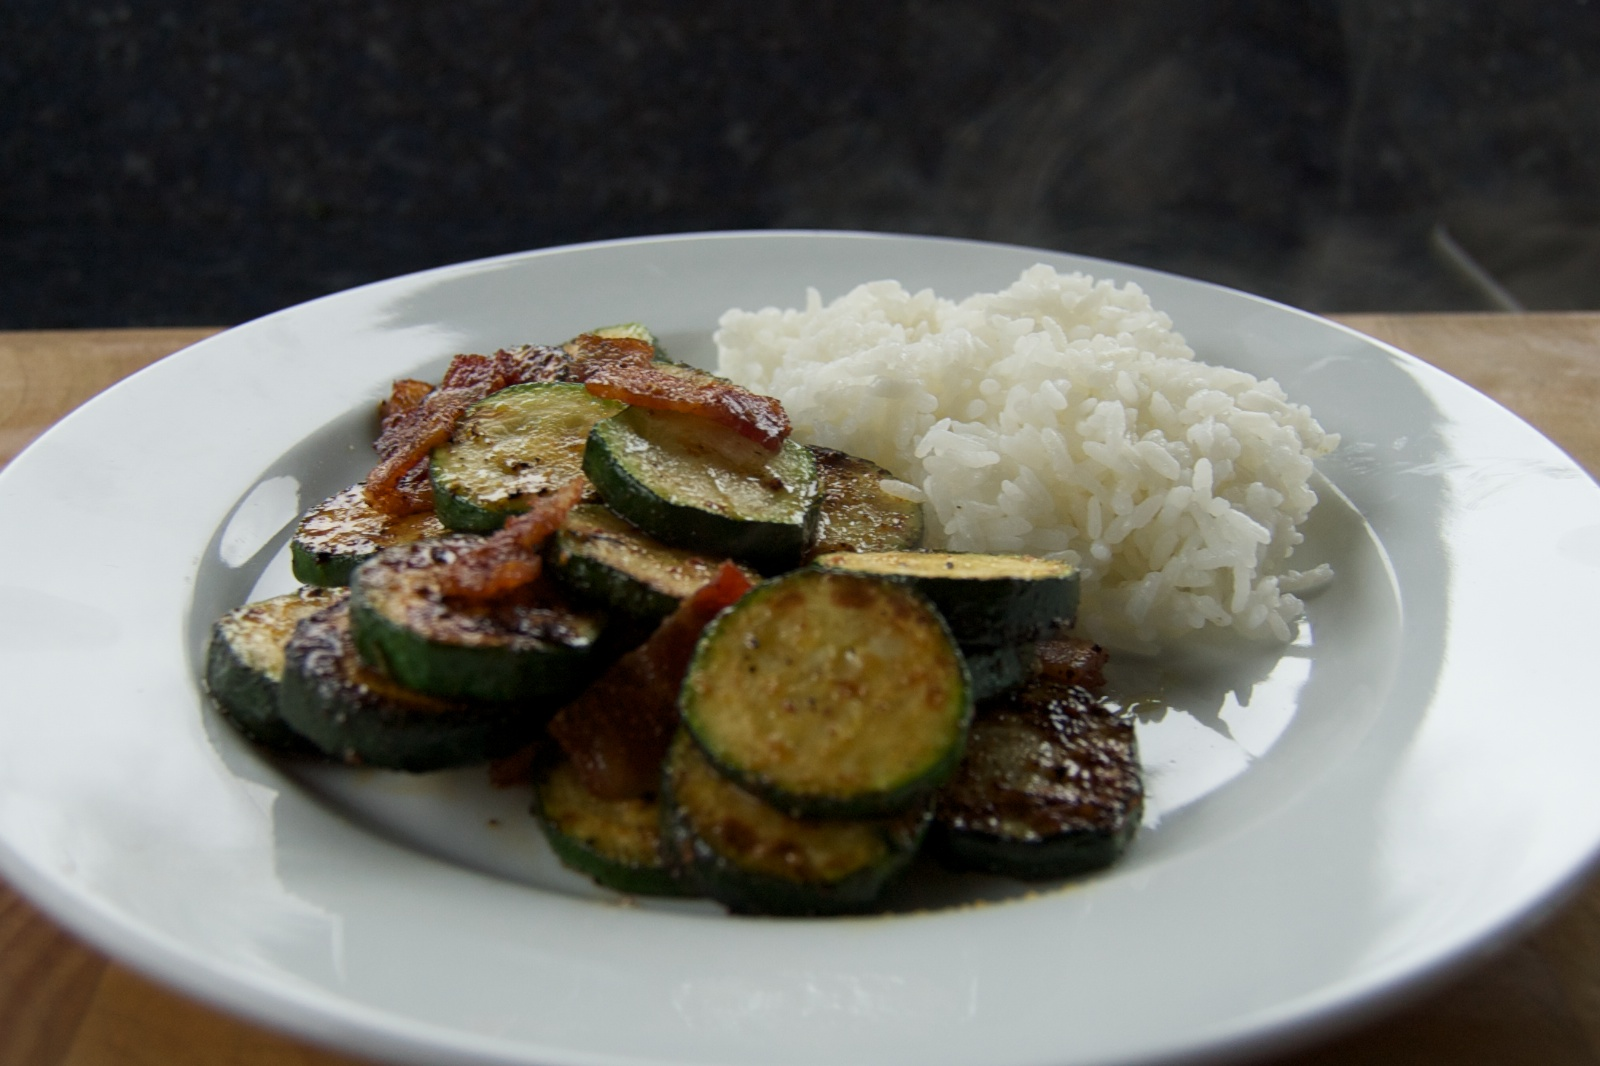 http://blog.rickk.com/food/2012/02/02/ate.2012.02.02.l.jpg